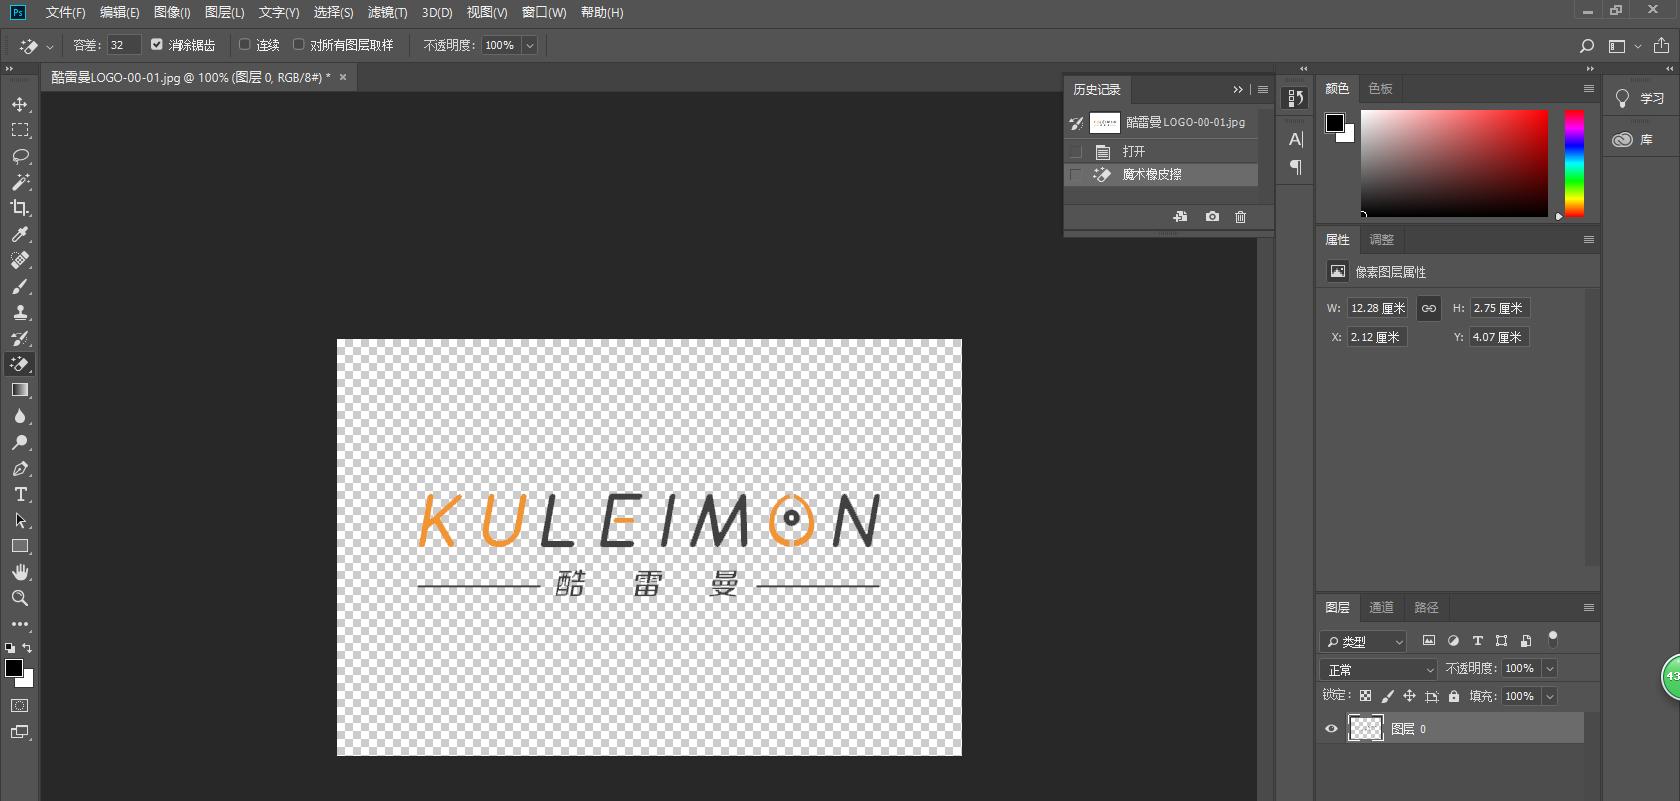 PS教程丨如何将logo图去底处理成透明背景图-酷雷曼全景问答